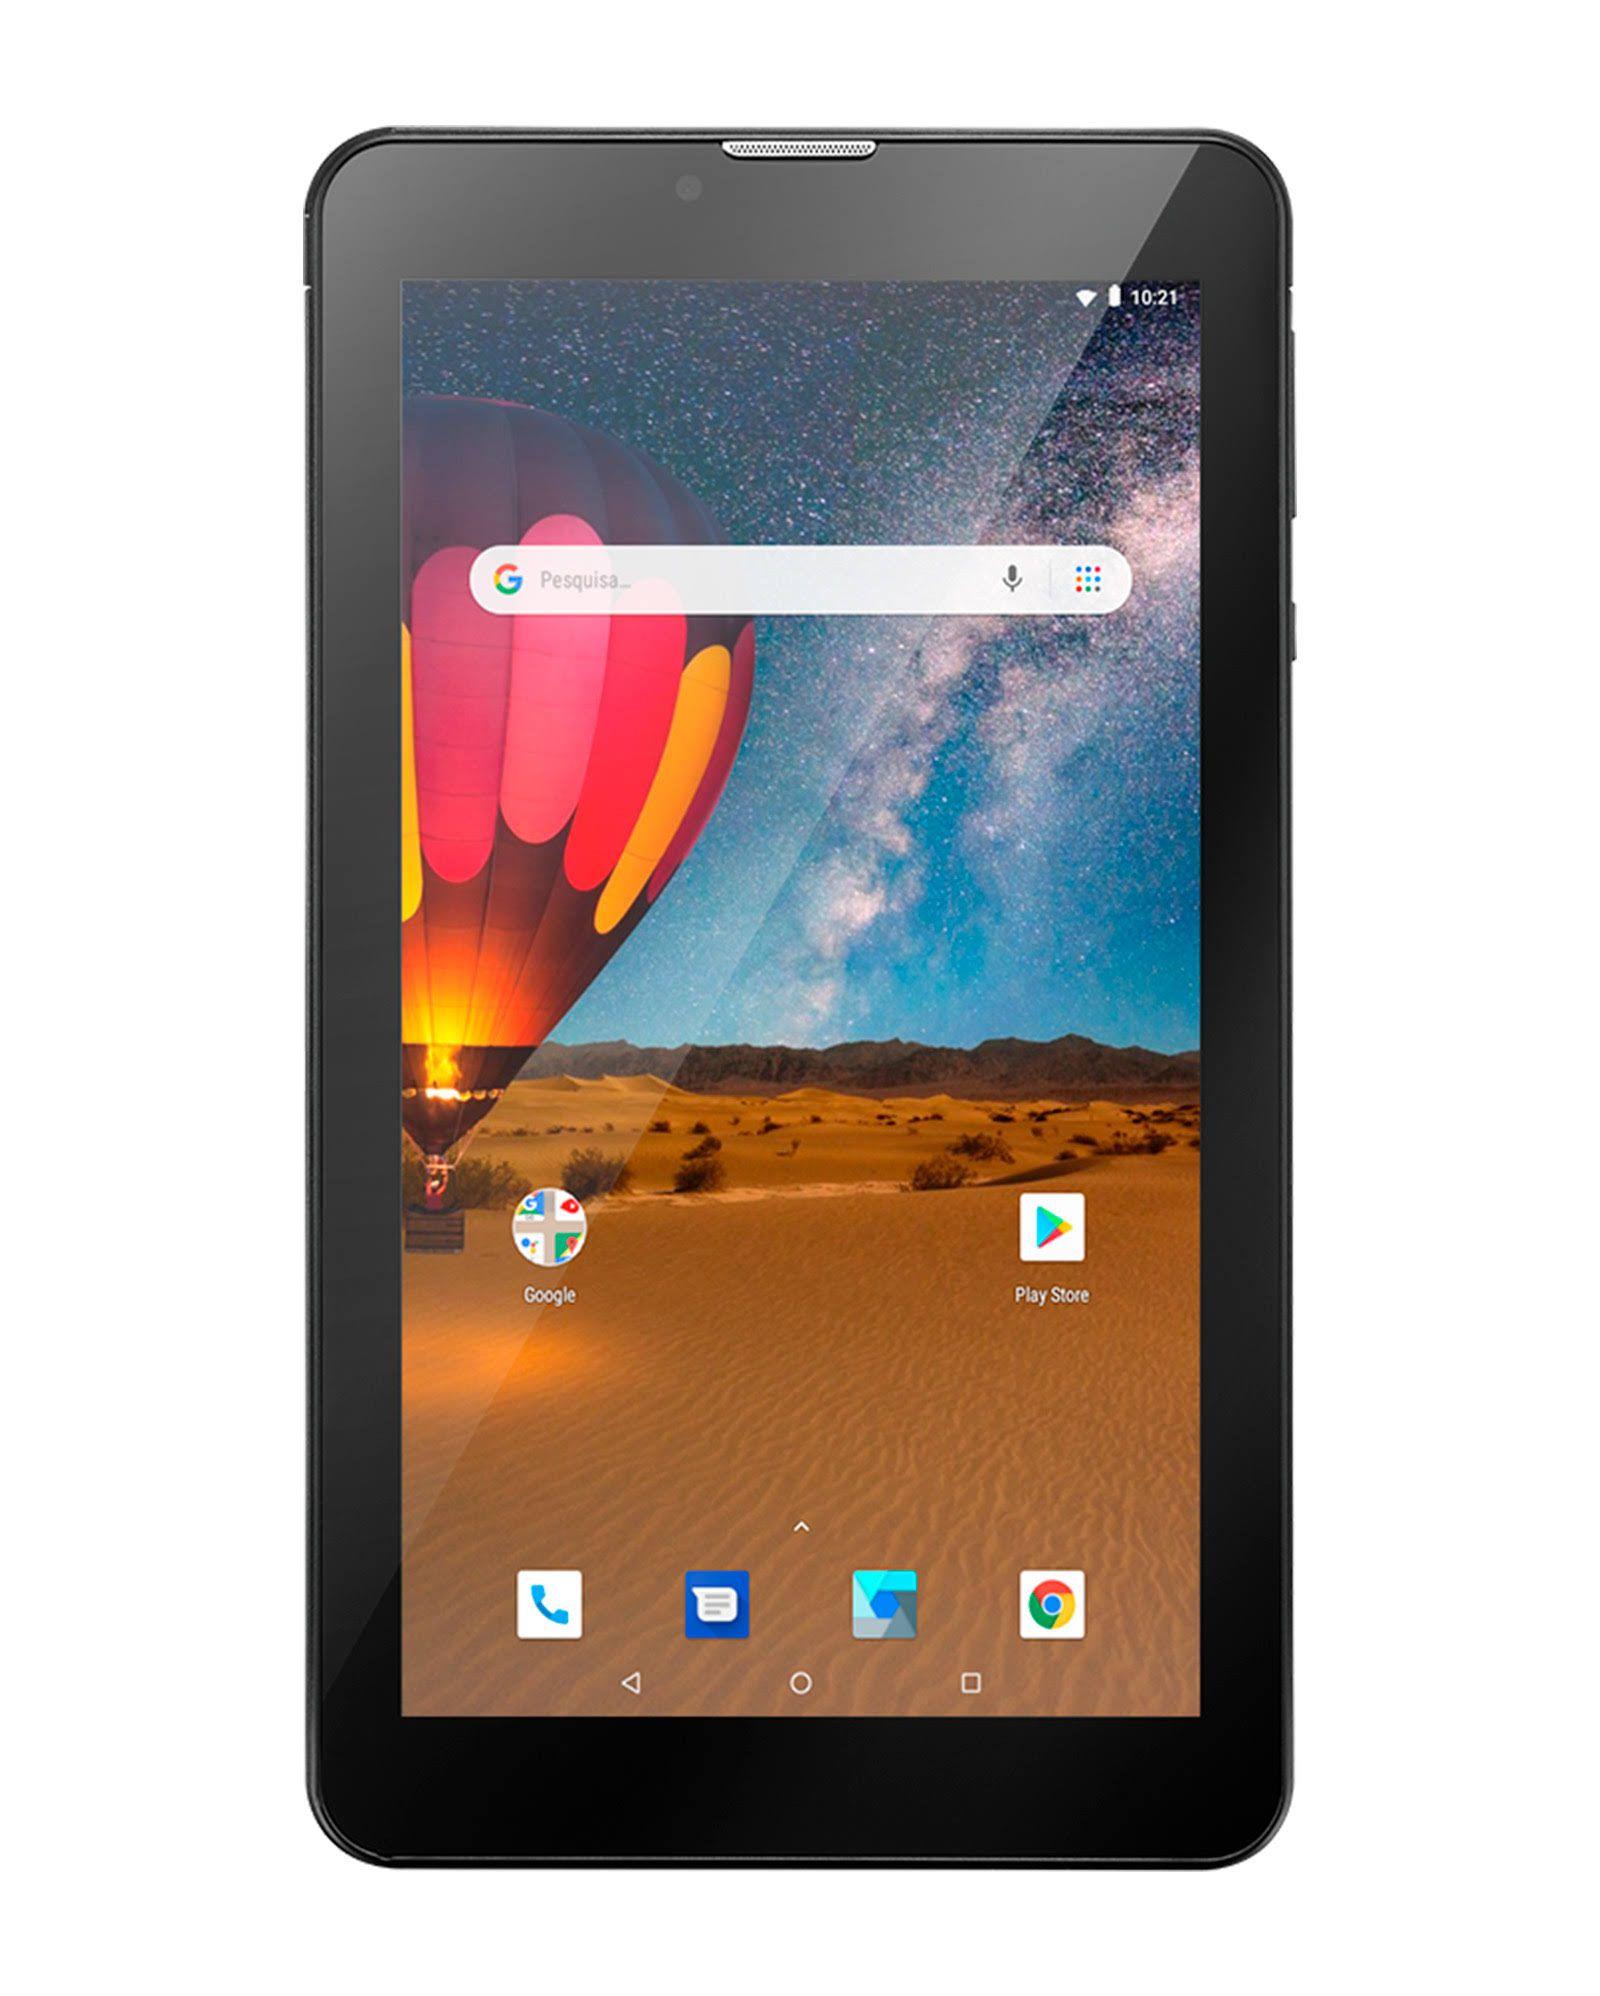 Tablet Multilaser M7 3g Plus Dual Chip Quad Core 1gb 16gb Tela 7 Pol 304/305/306